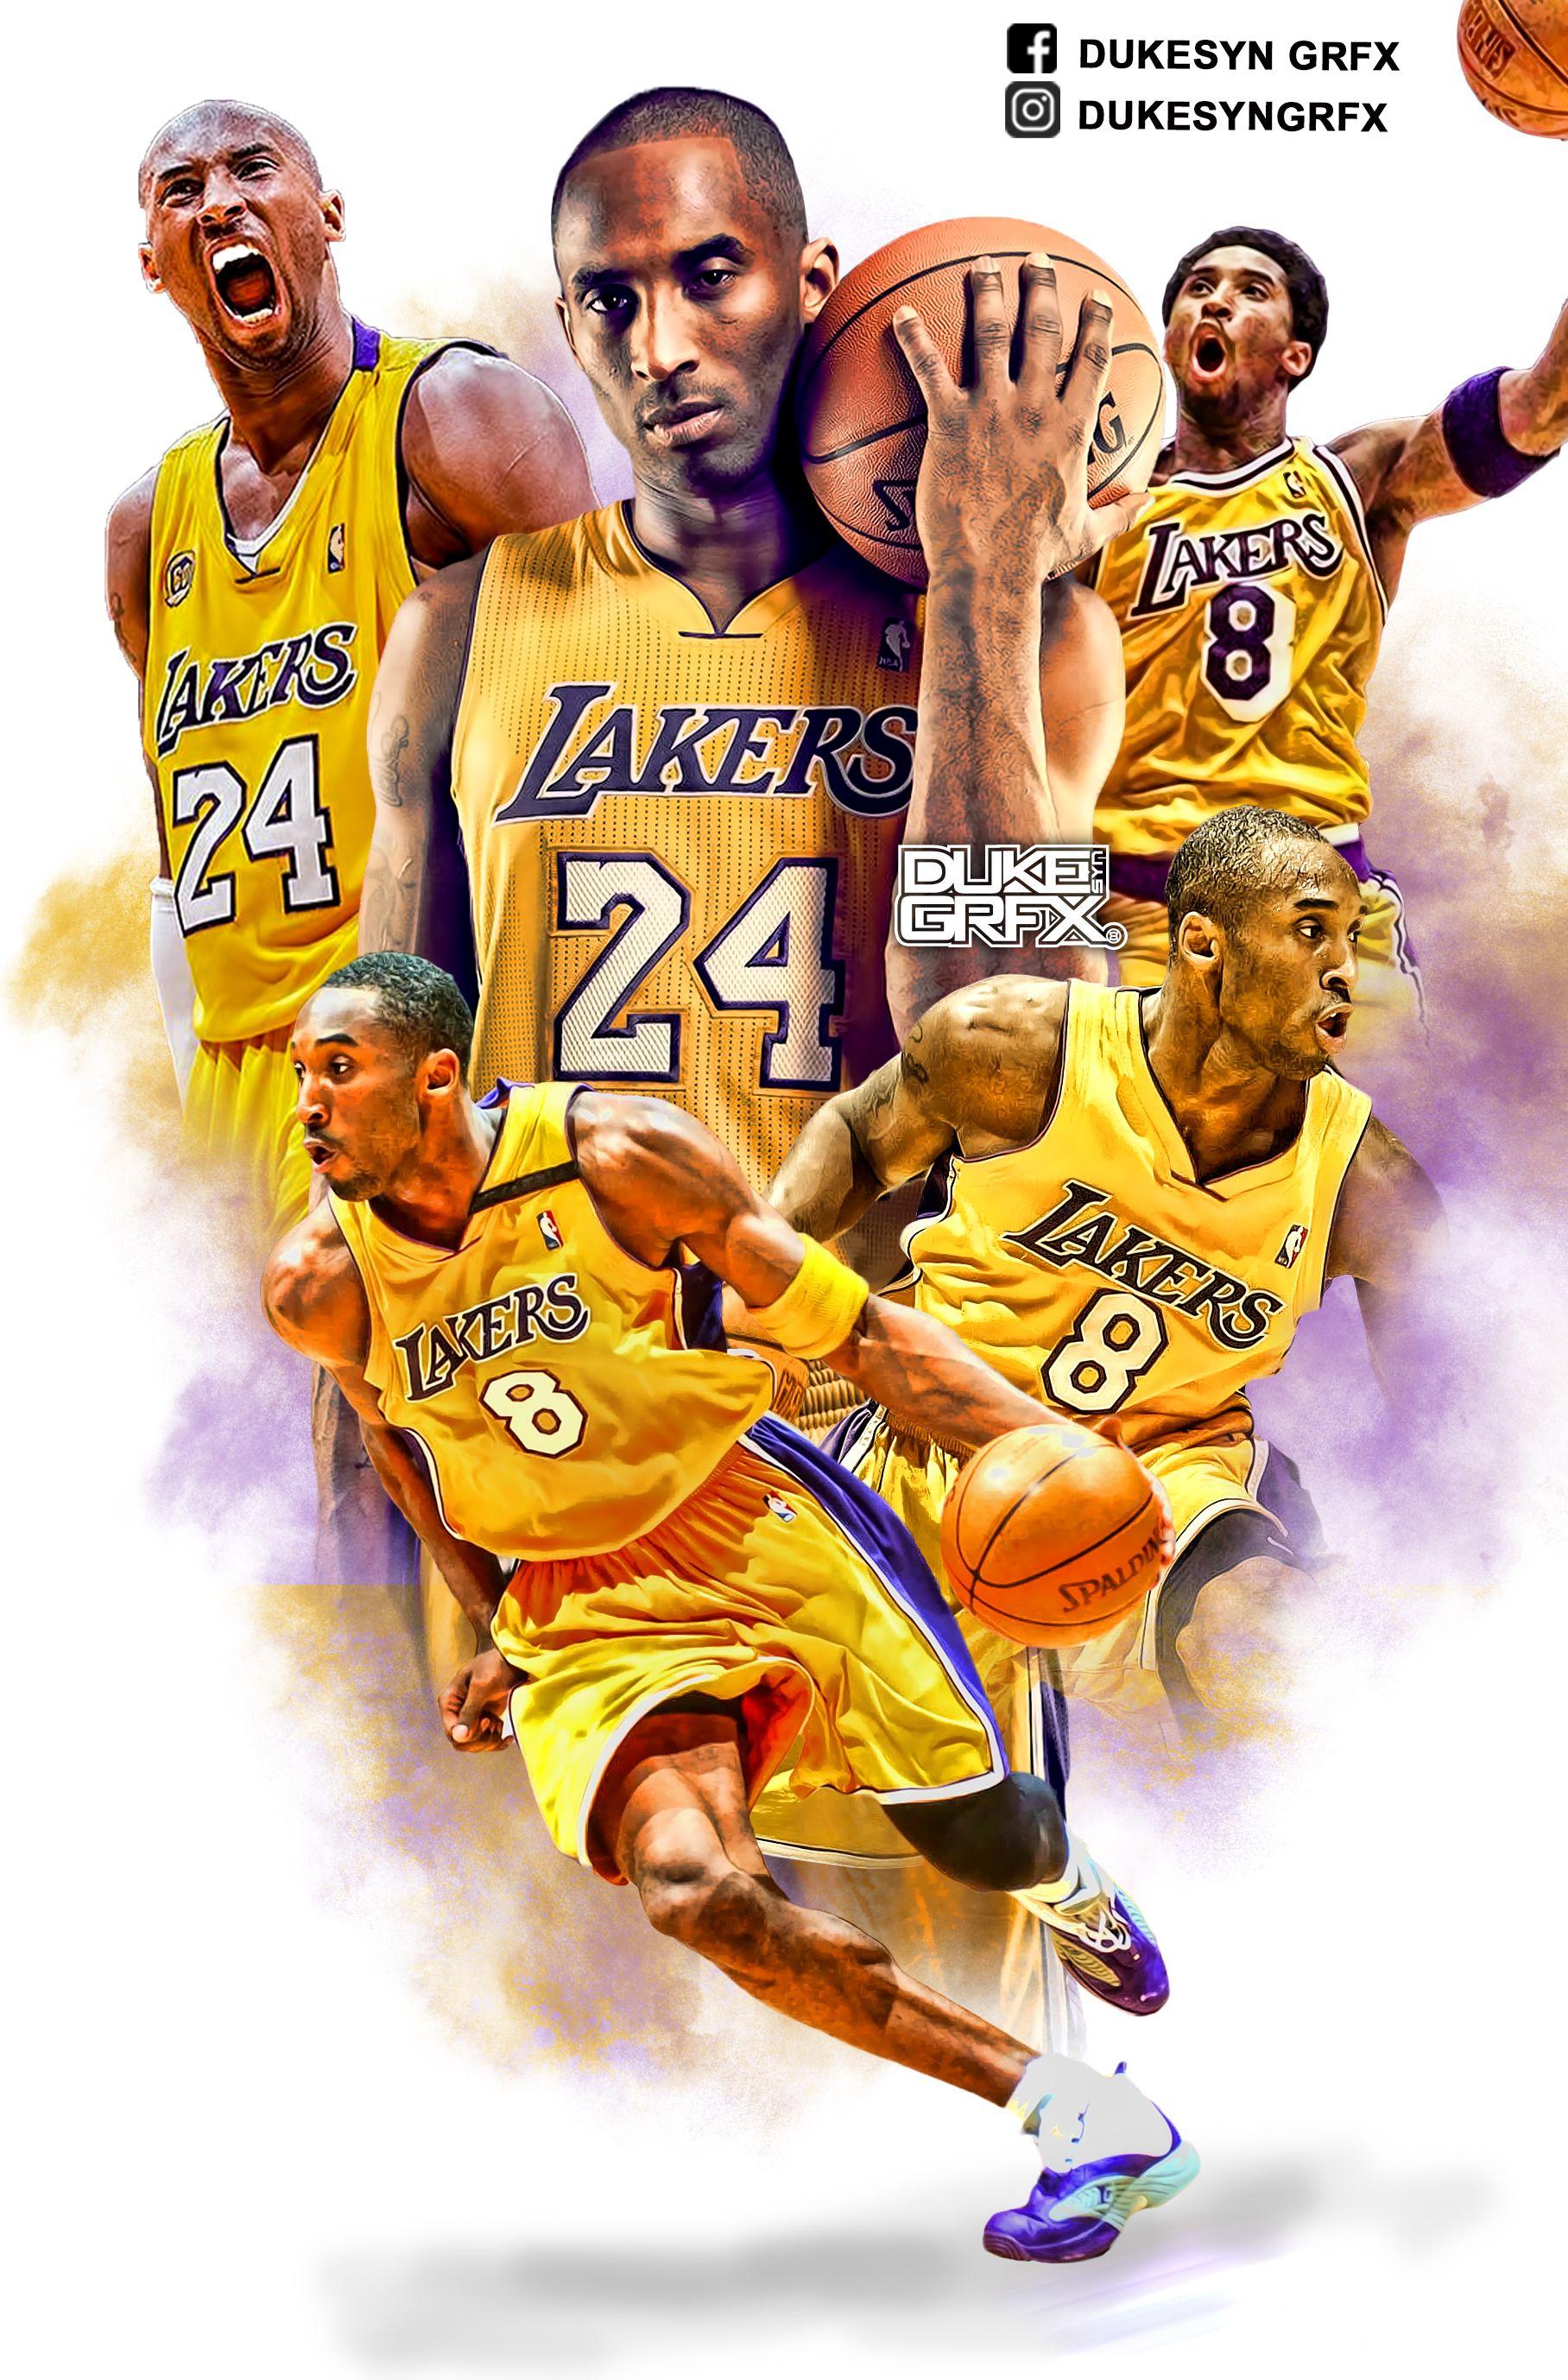 Mamba Out 824 Kobe Bryant Pictures Kobe Bryant Black Mamba Kobe Bryant Quotes Black mamba basketball black mamba kobe